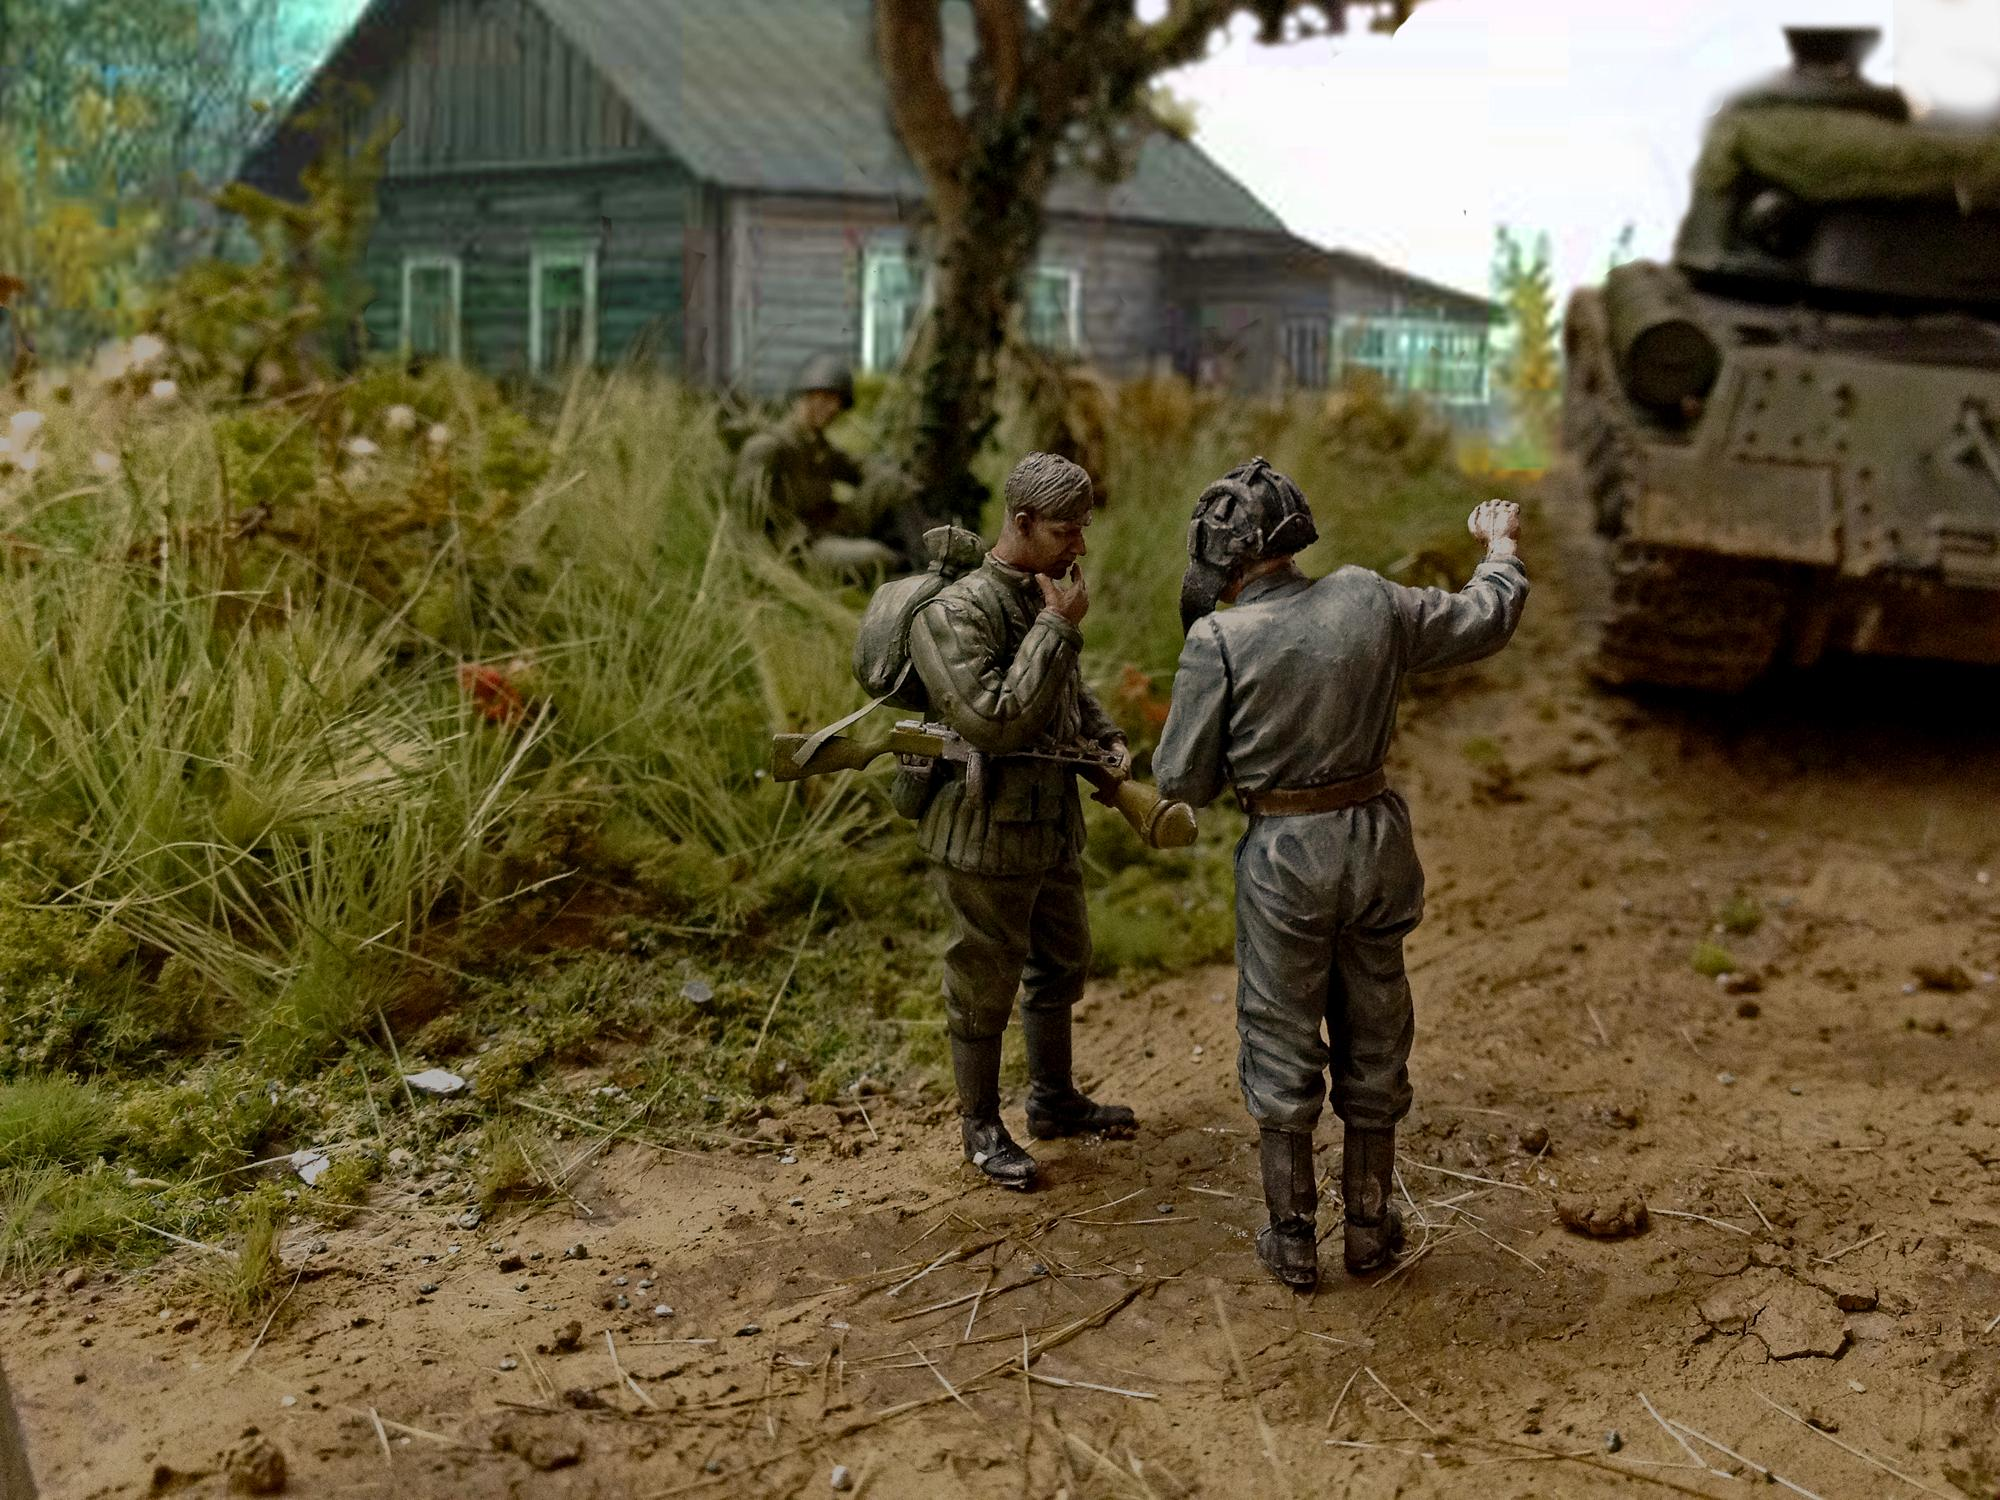 Diorama, Historical, Infanty, Russians, World War 2